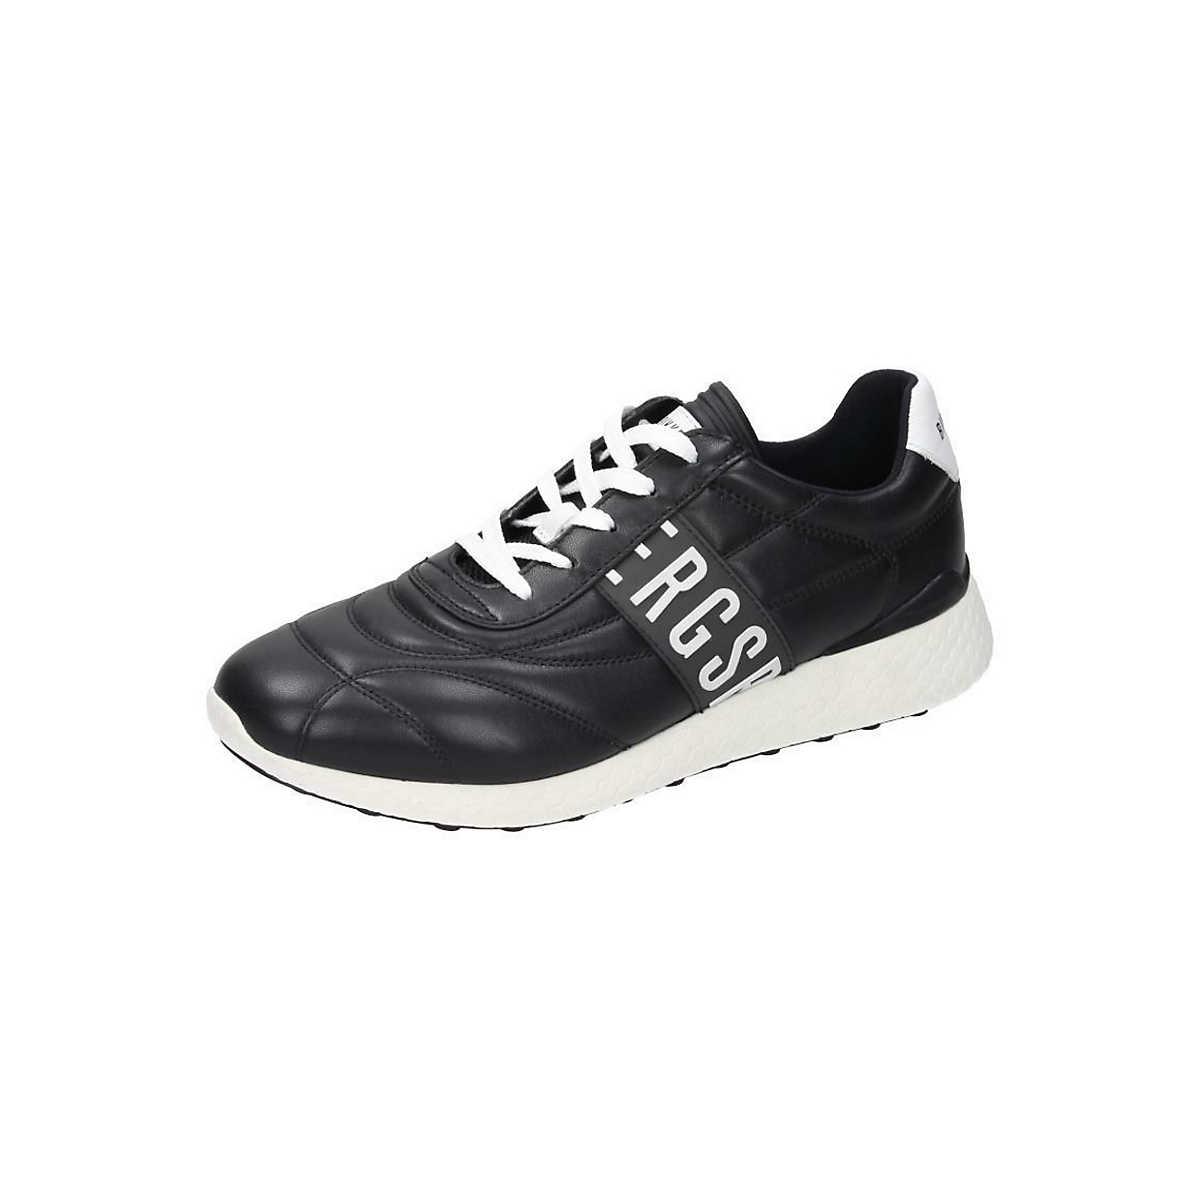 Bikkembergs Sneakers schwarz - Bikkembergs - Sneakers - Schuhe - mirapodo.de